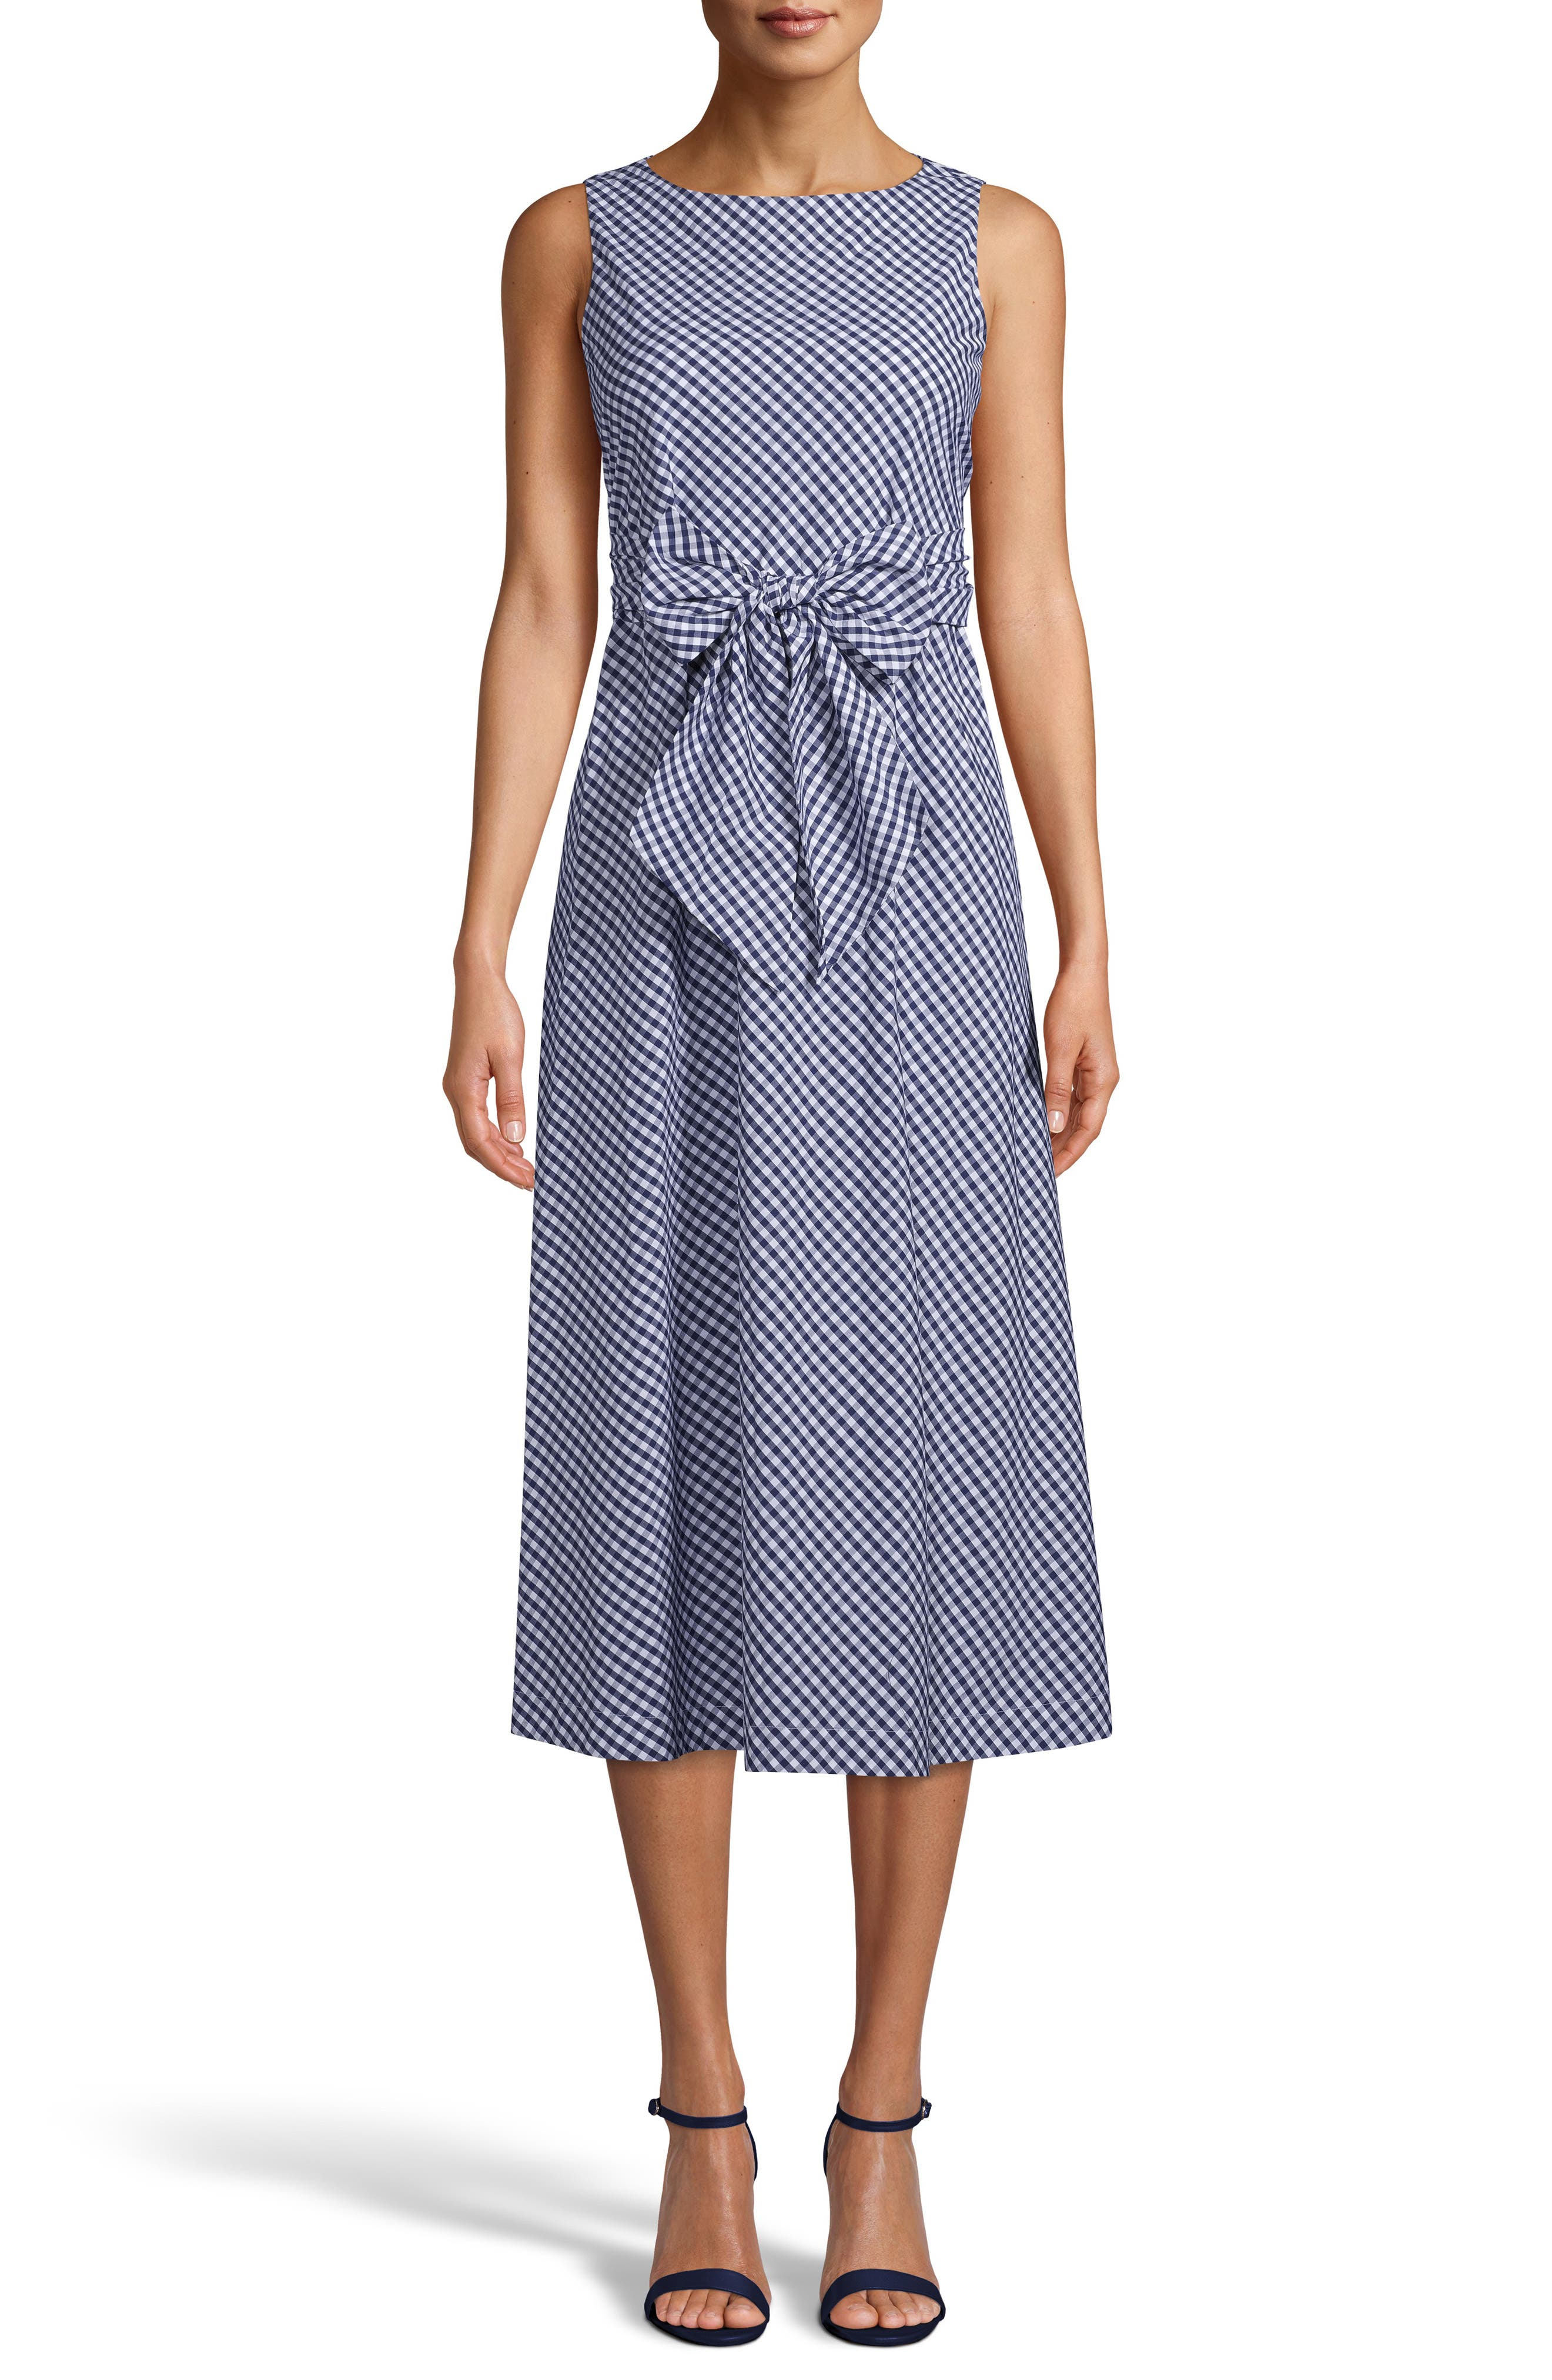 Gingham Cotton Midi Dress